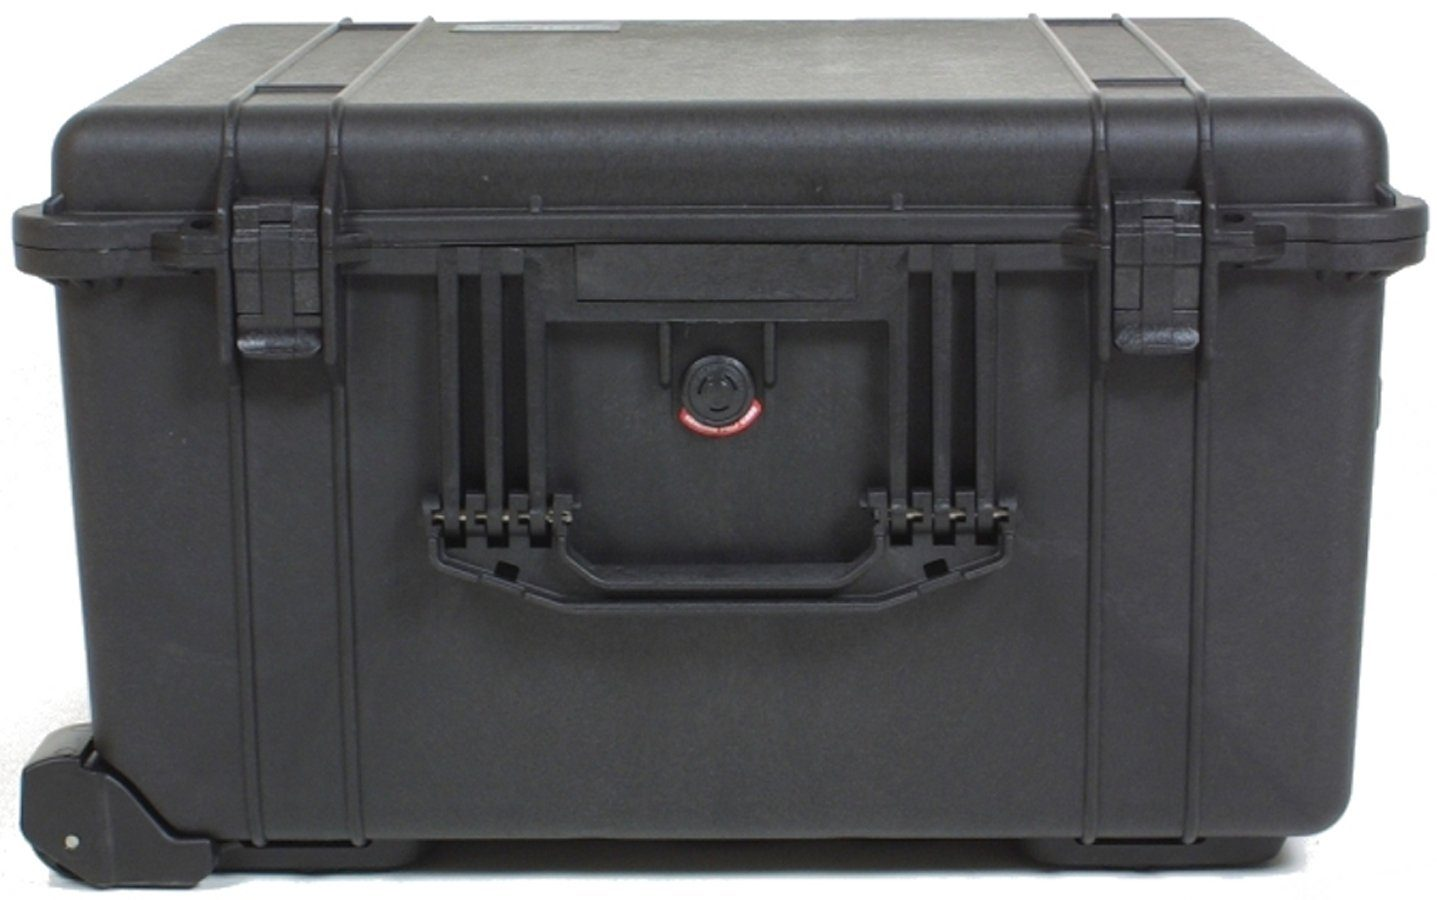 Peli Campingtruhe & -Kiste »box 1620 ohne Schaumeinsatz«